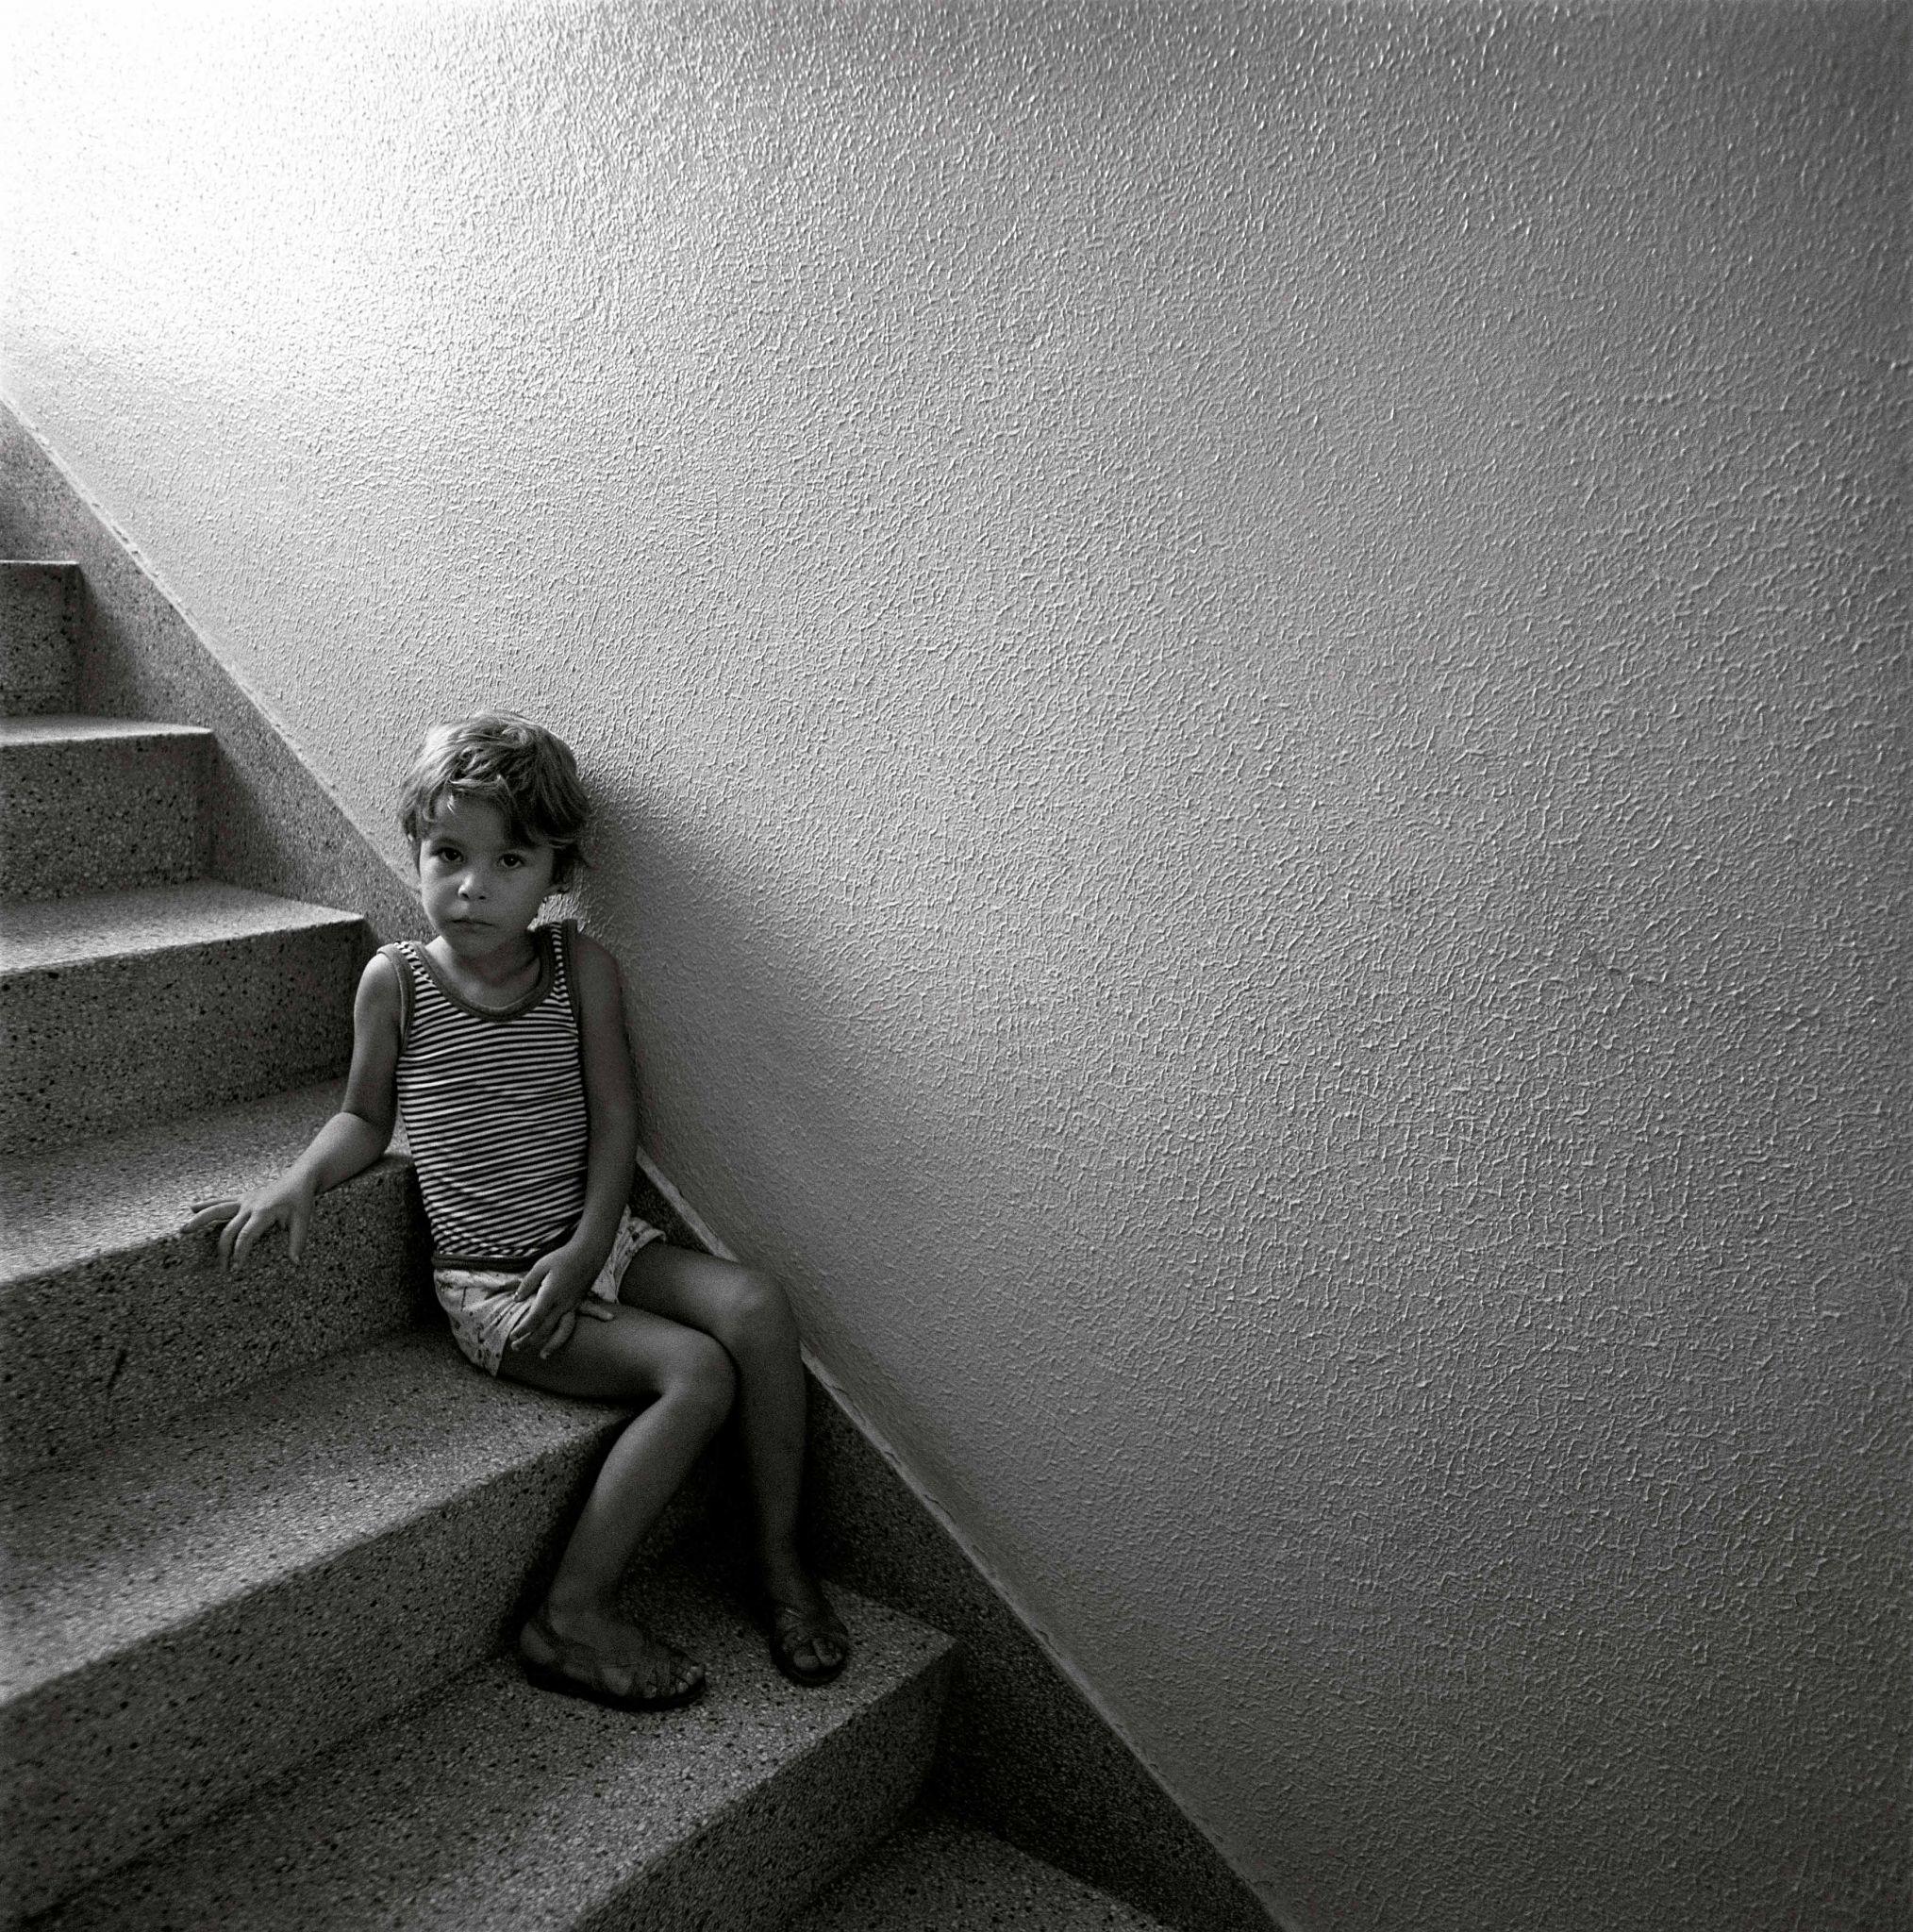 1979-61-01-menino-na-escada-2